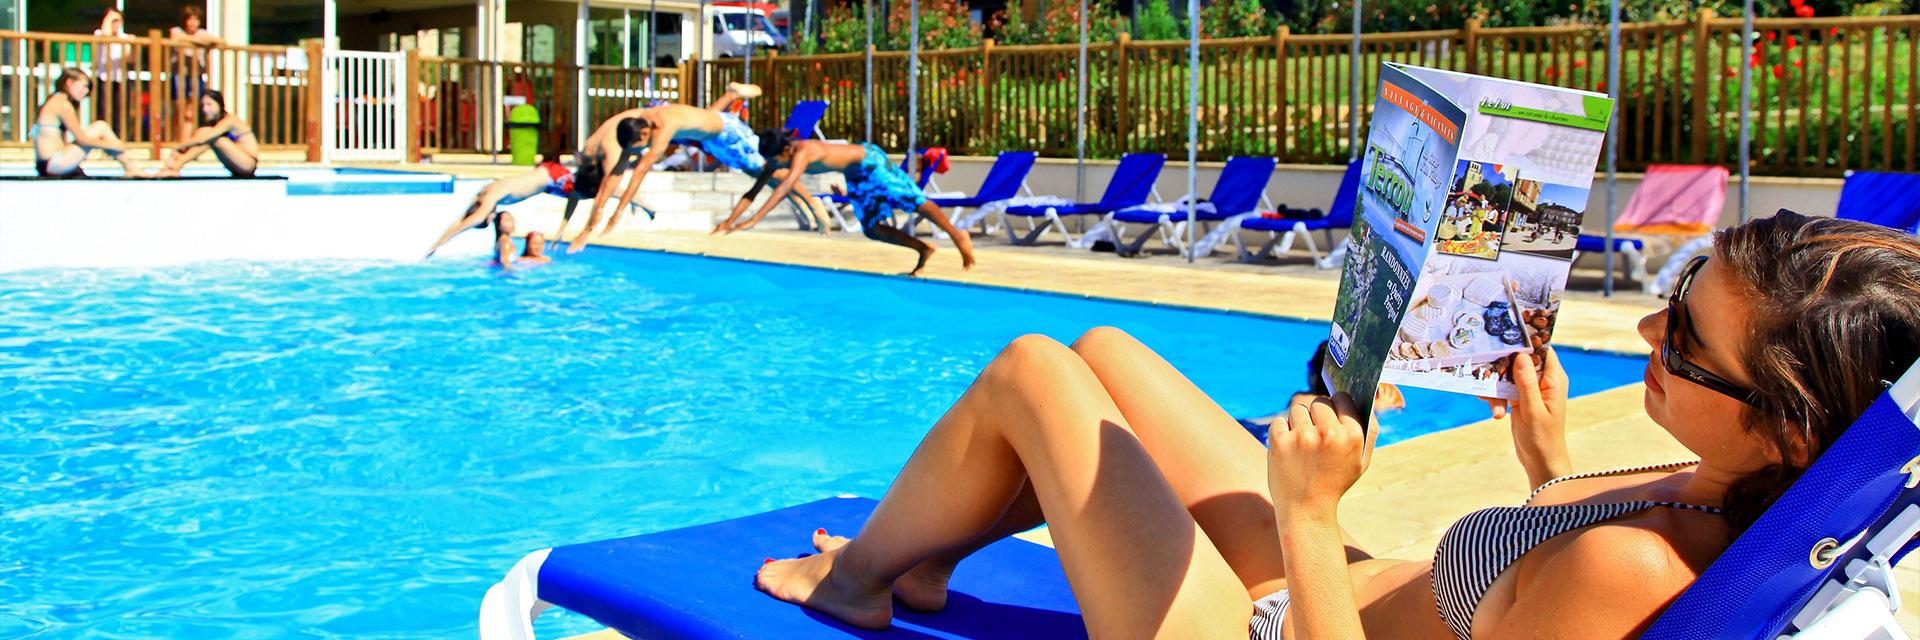 Village_club_vacances_périgord-quercy-terrou-piscine